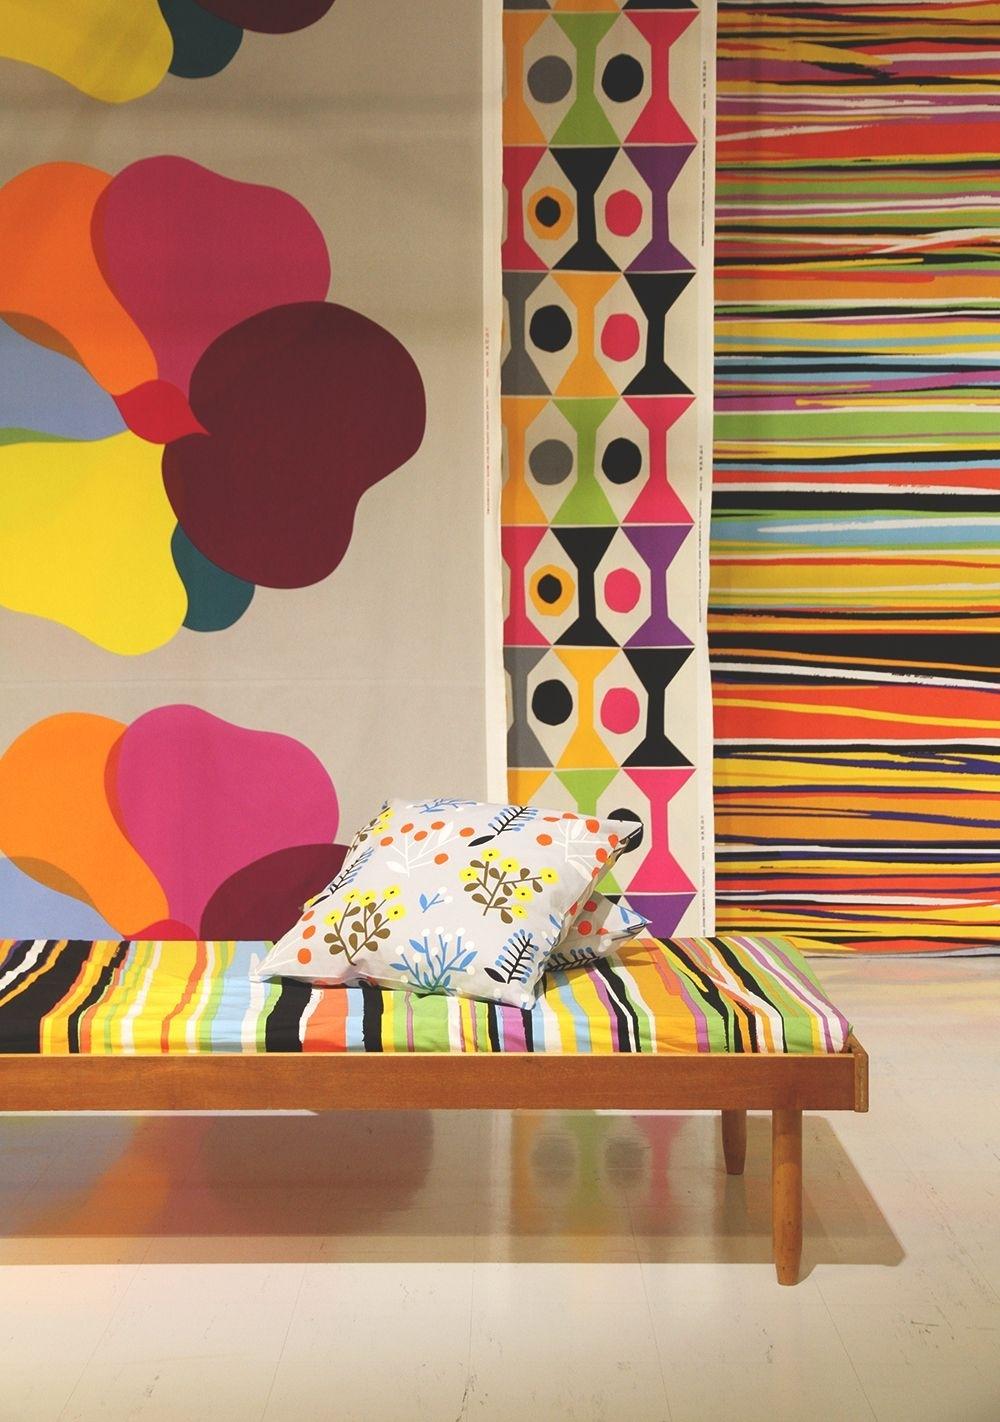 Marimekko Wall Hanging | Marimekko For The House | Pinterest For Latest Marimekko 'karkuteilla' Fabric Wall Art (View 10 of 15)